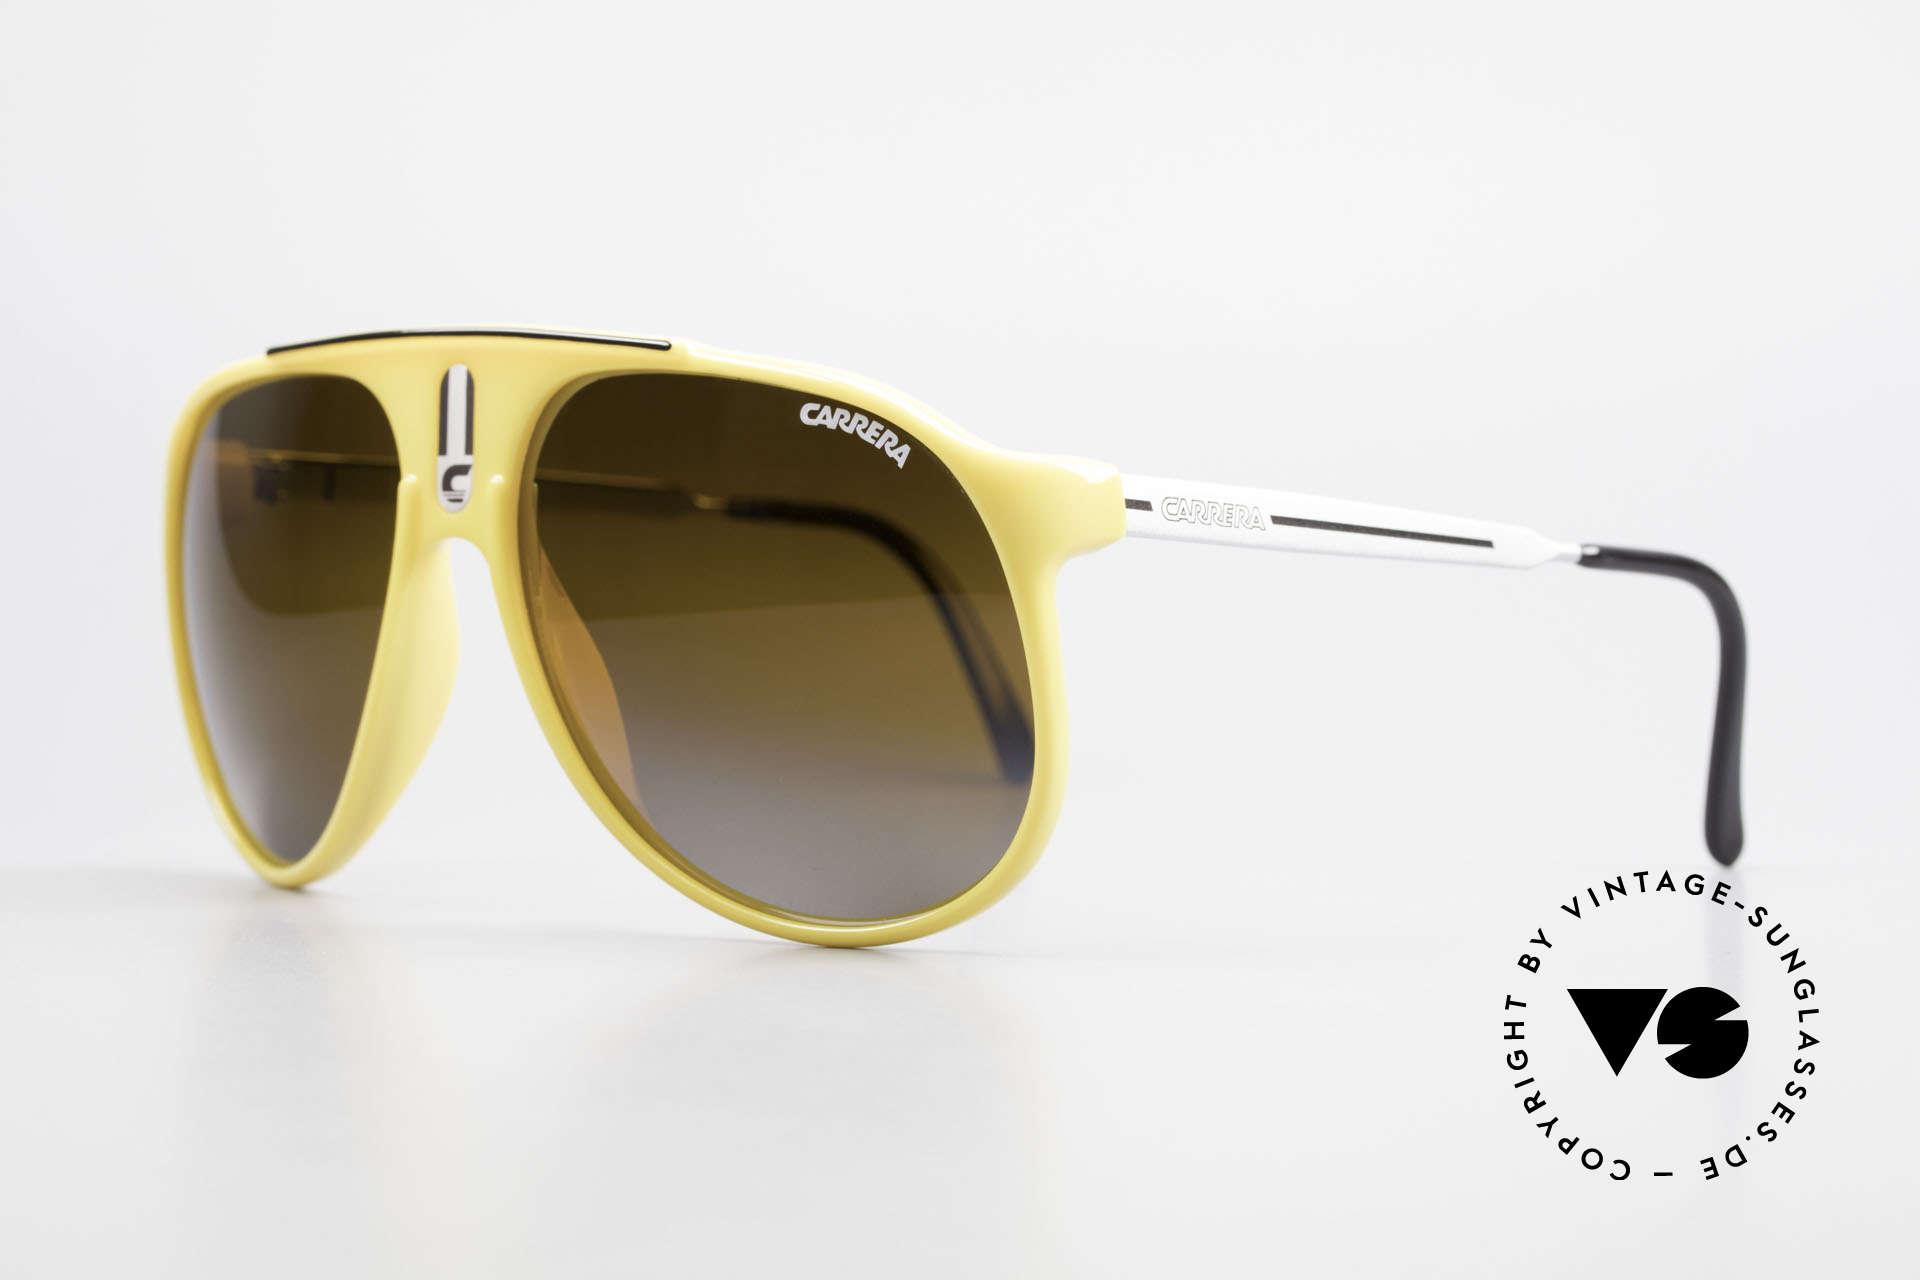 "Carrera 5424 Rare Mirrored 80's Sunglasses, combination of ""Sport Performance"" & aviator style, Made for Men"